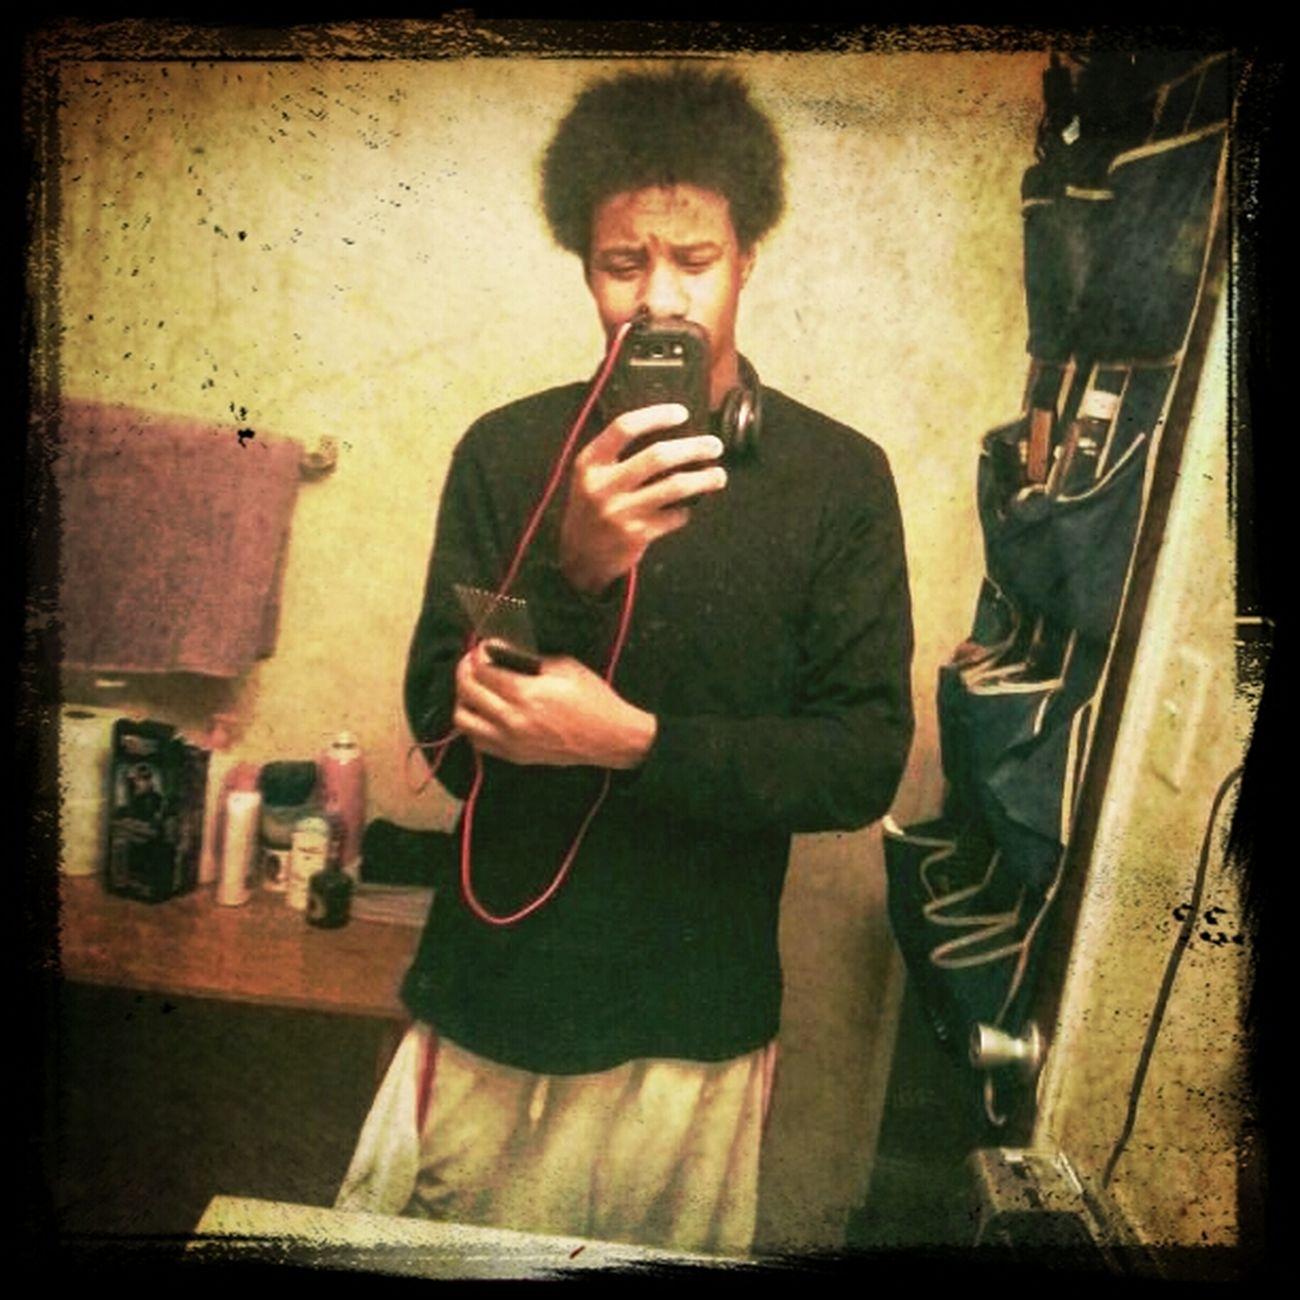 wild hair ..afro nigga Fro